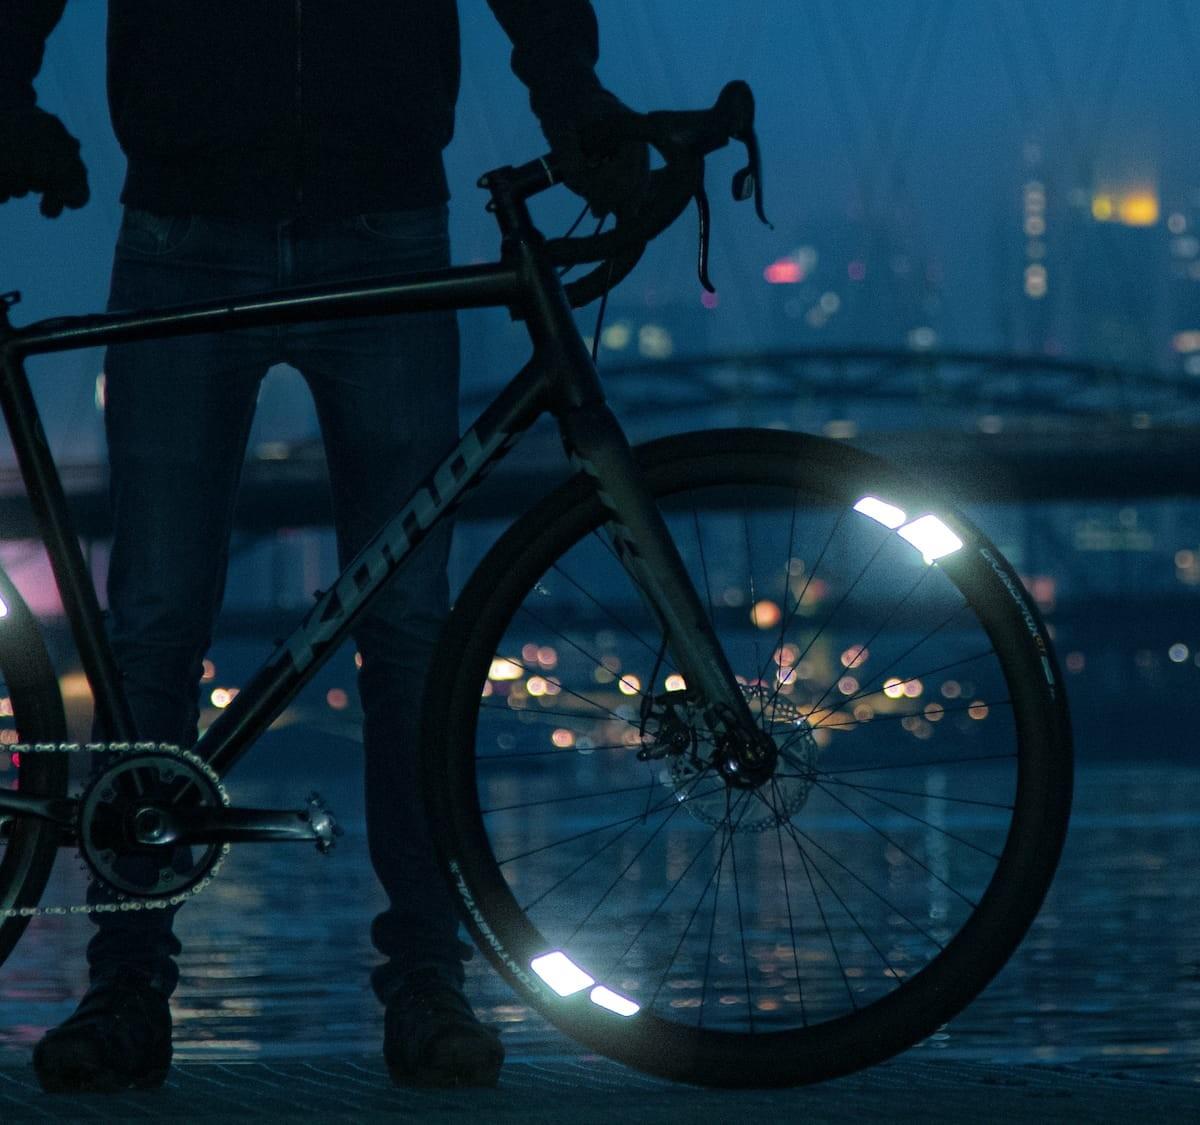 FLECTR 360 bike wheel reflector provides incredible 360º visibility